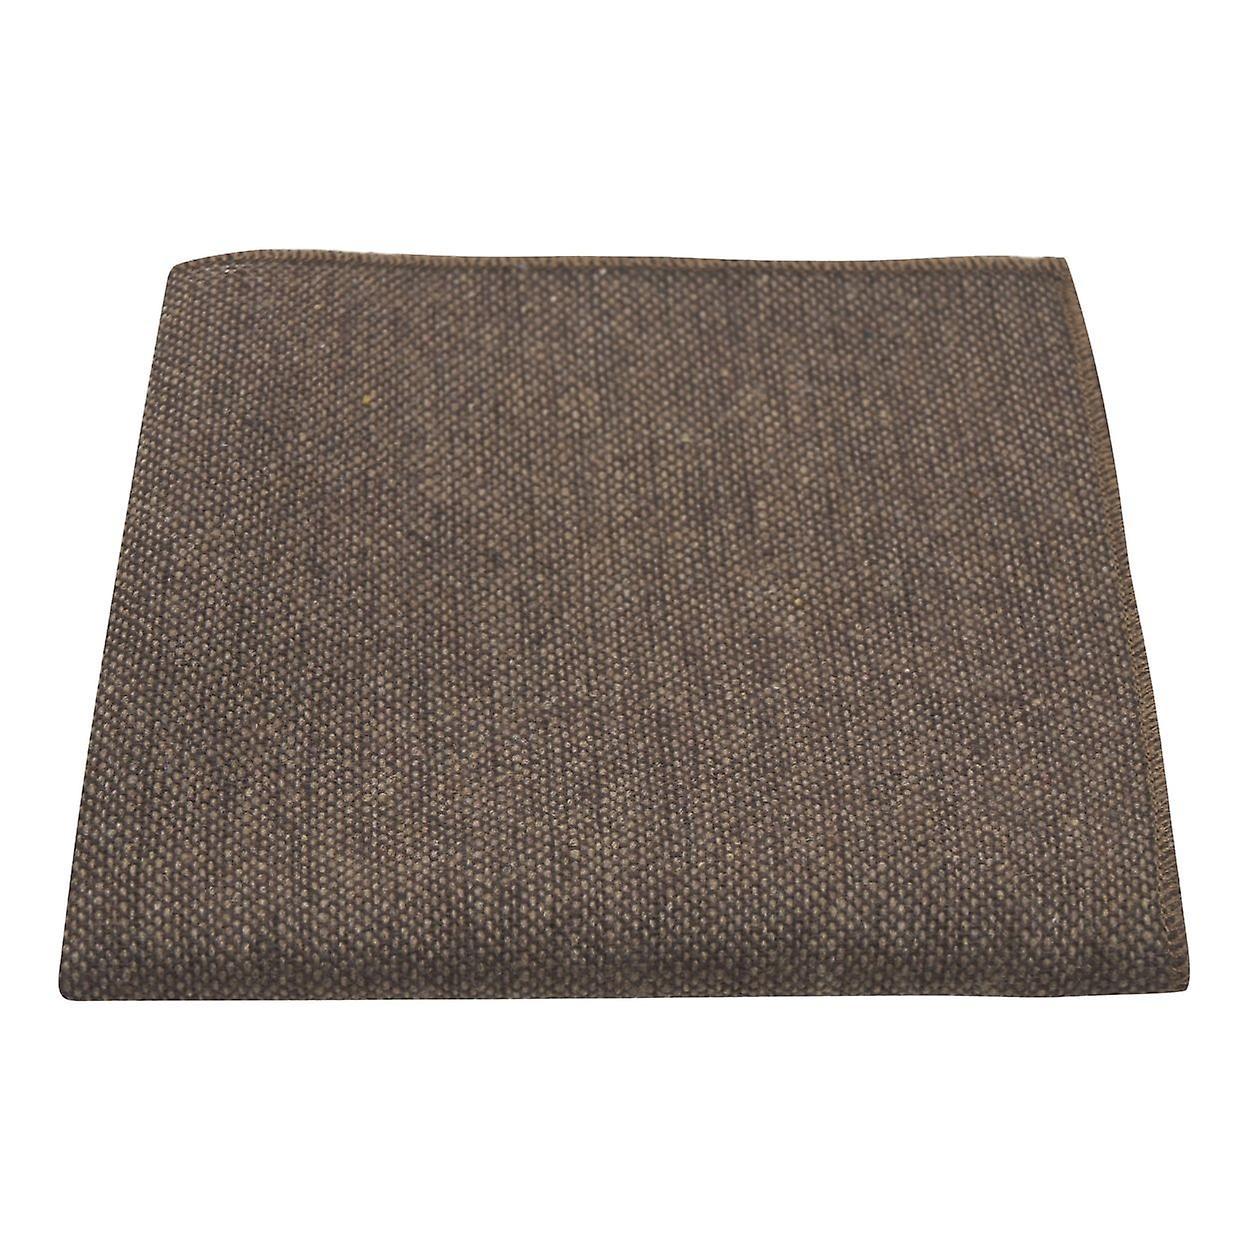 Highland Weave Hessian Brown Pocket Square, Handkerchief